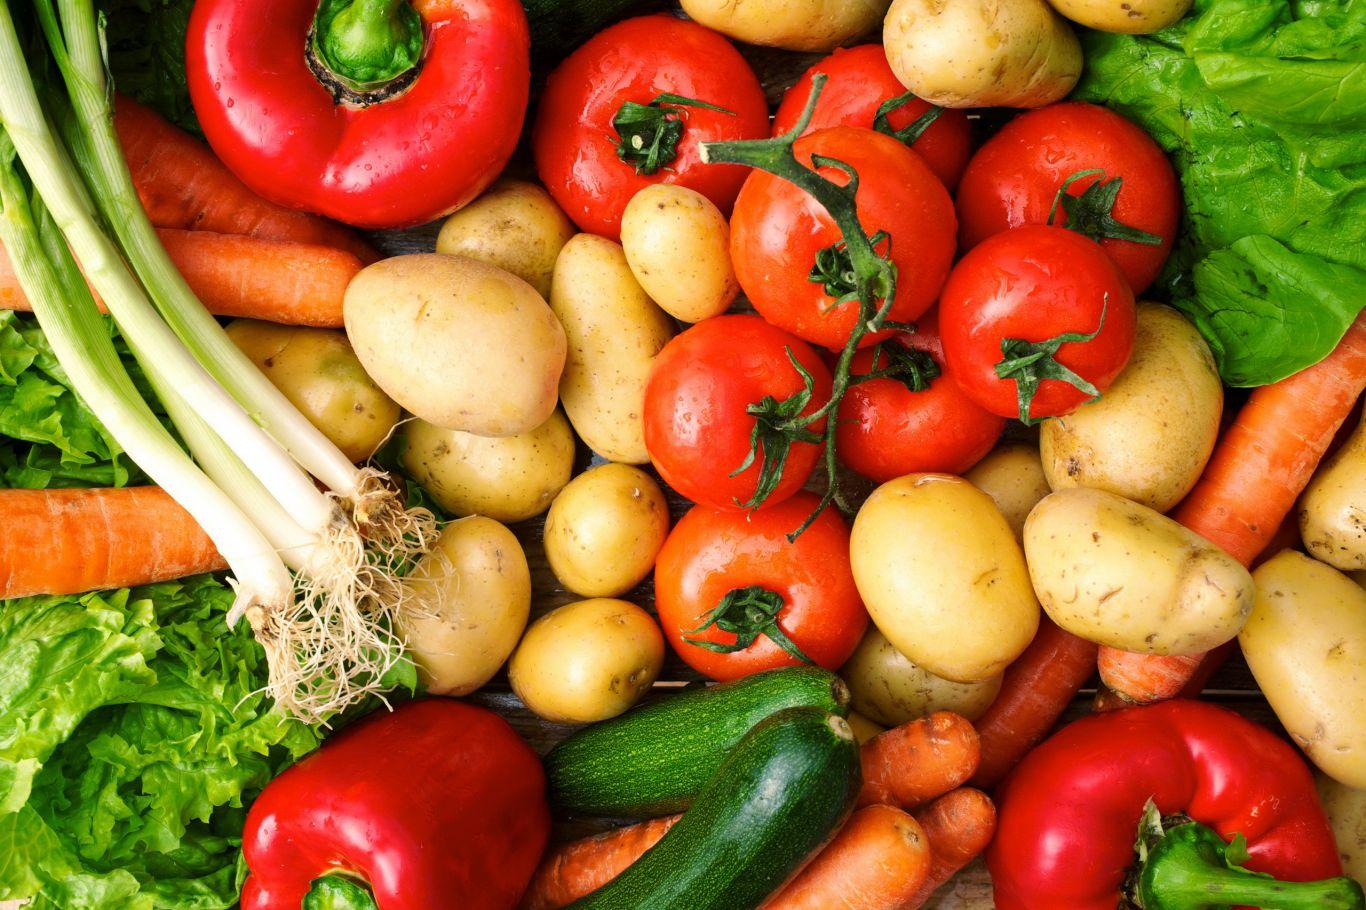 Ххх овощи в 5 фотография